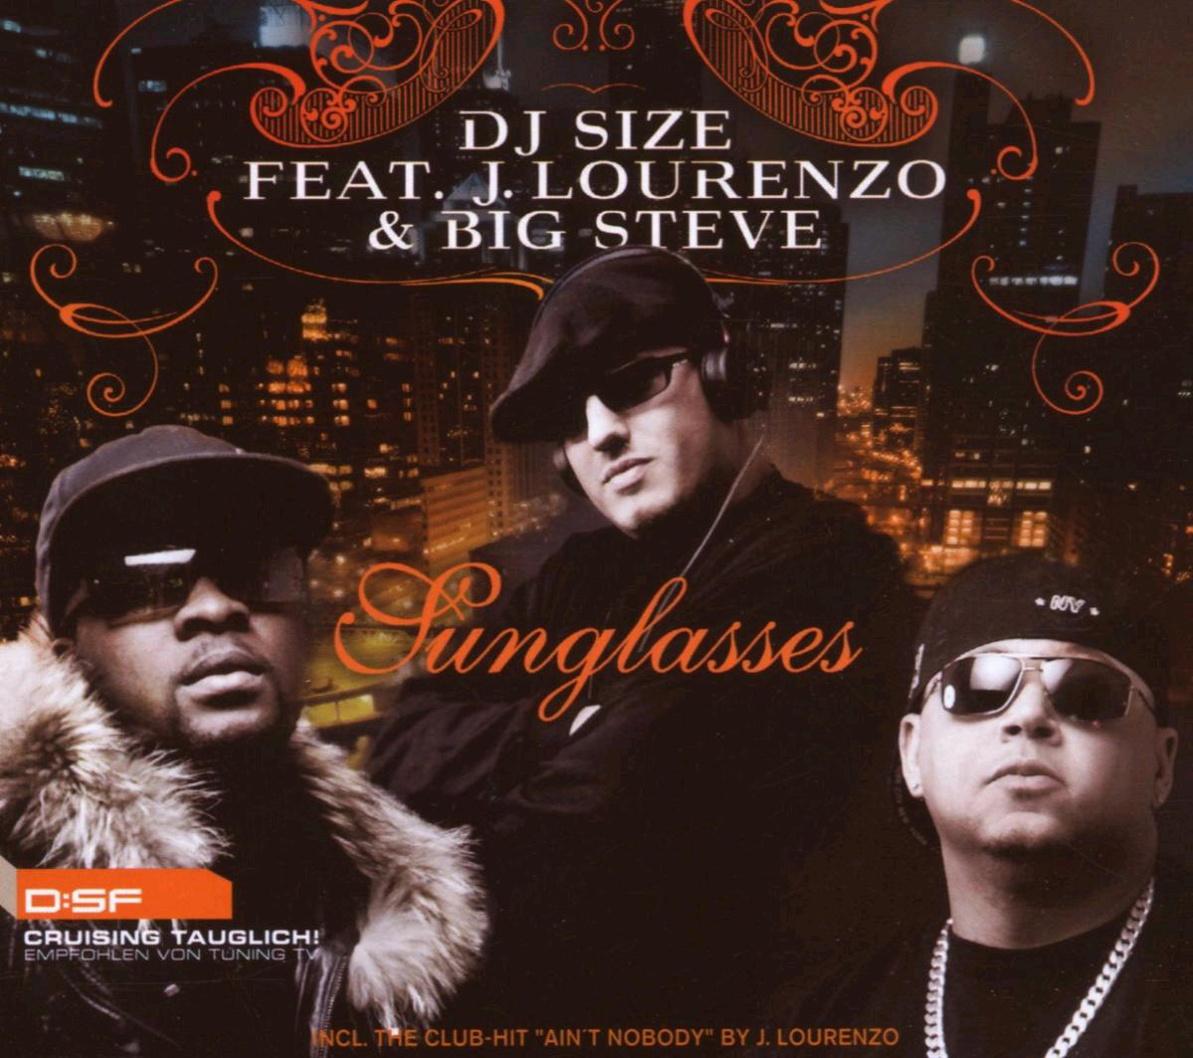 DJ Size Feat.J.Lourenzo & Big Steve - Sunglasses